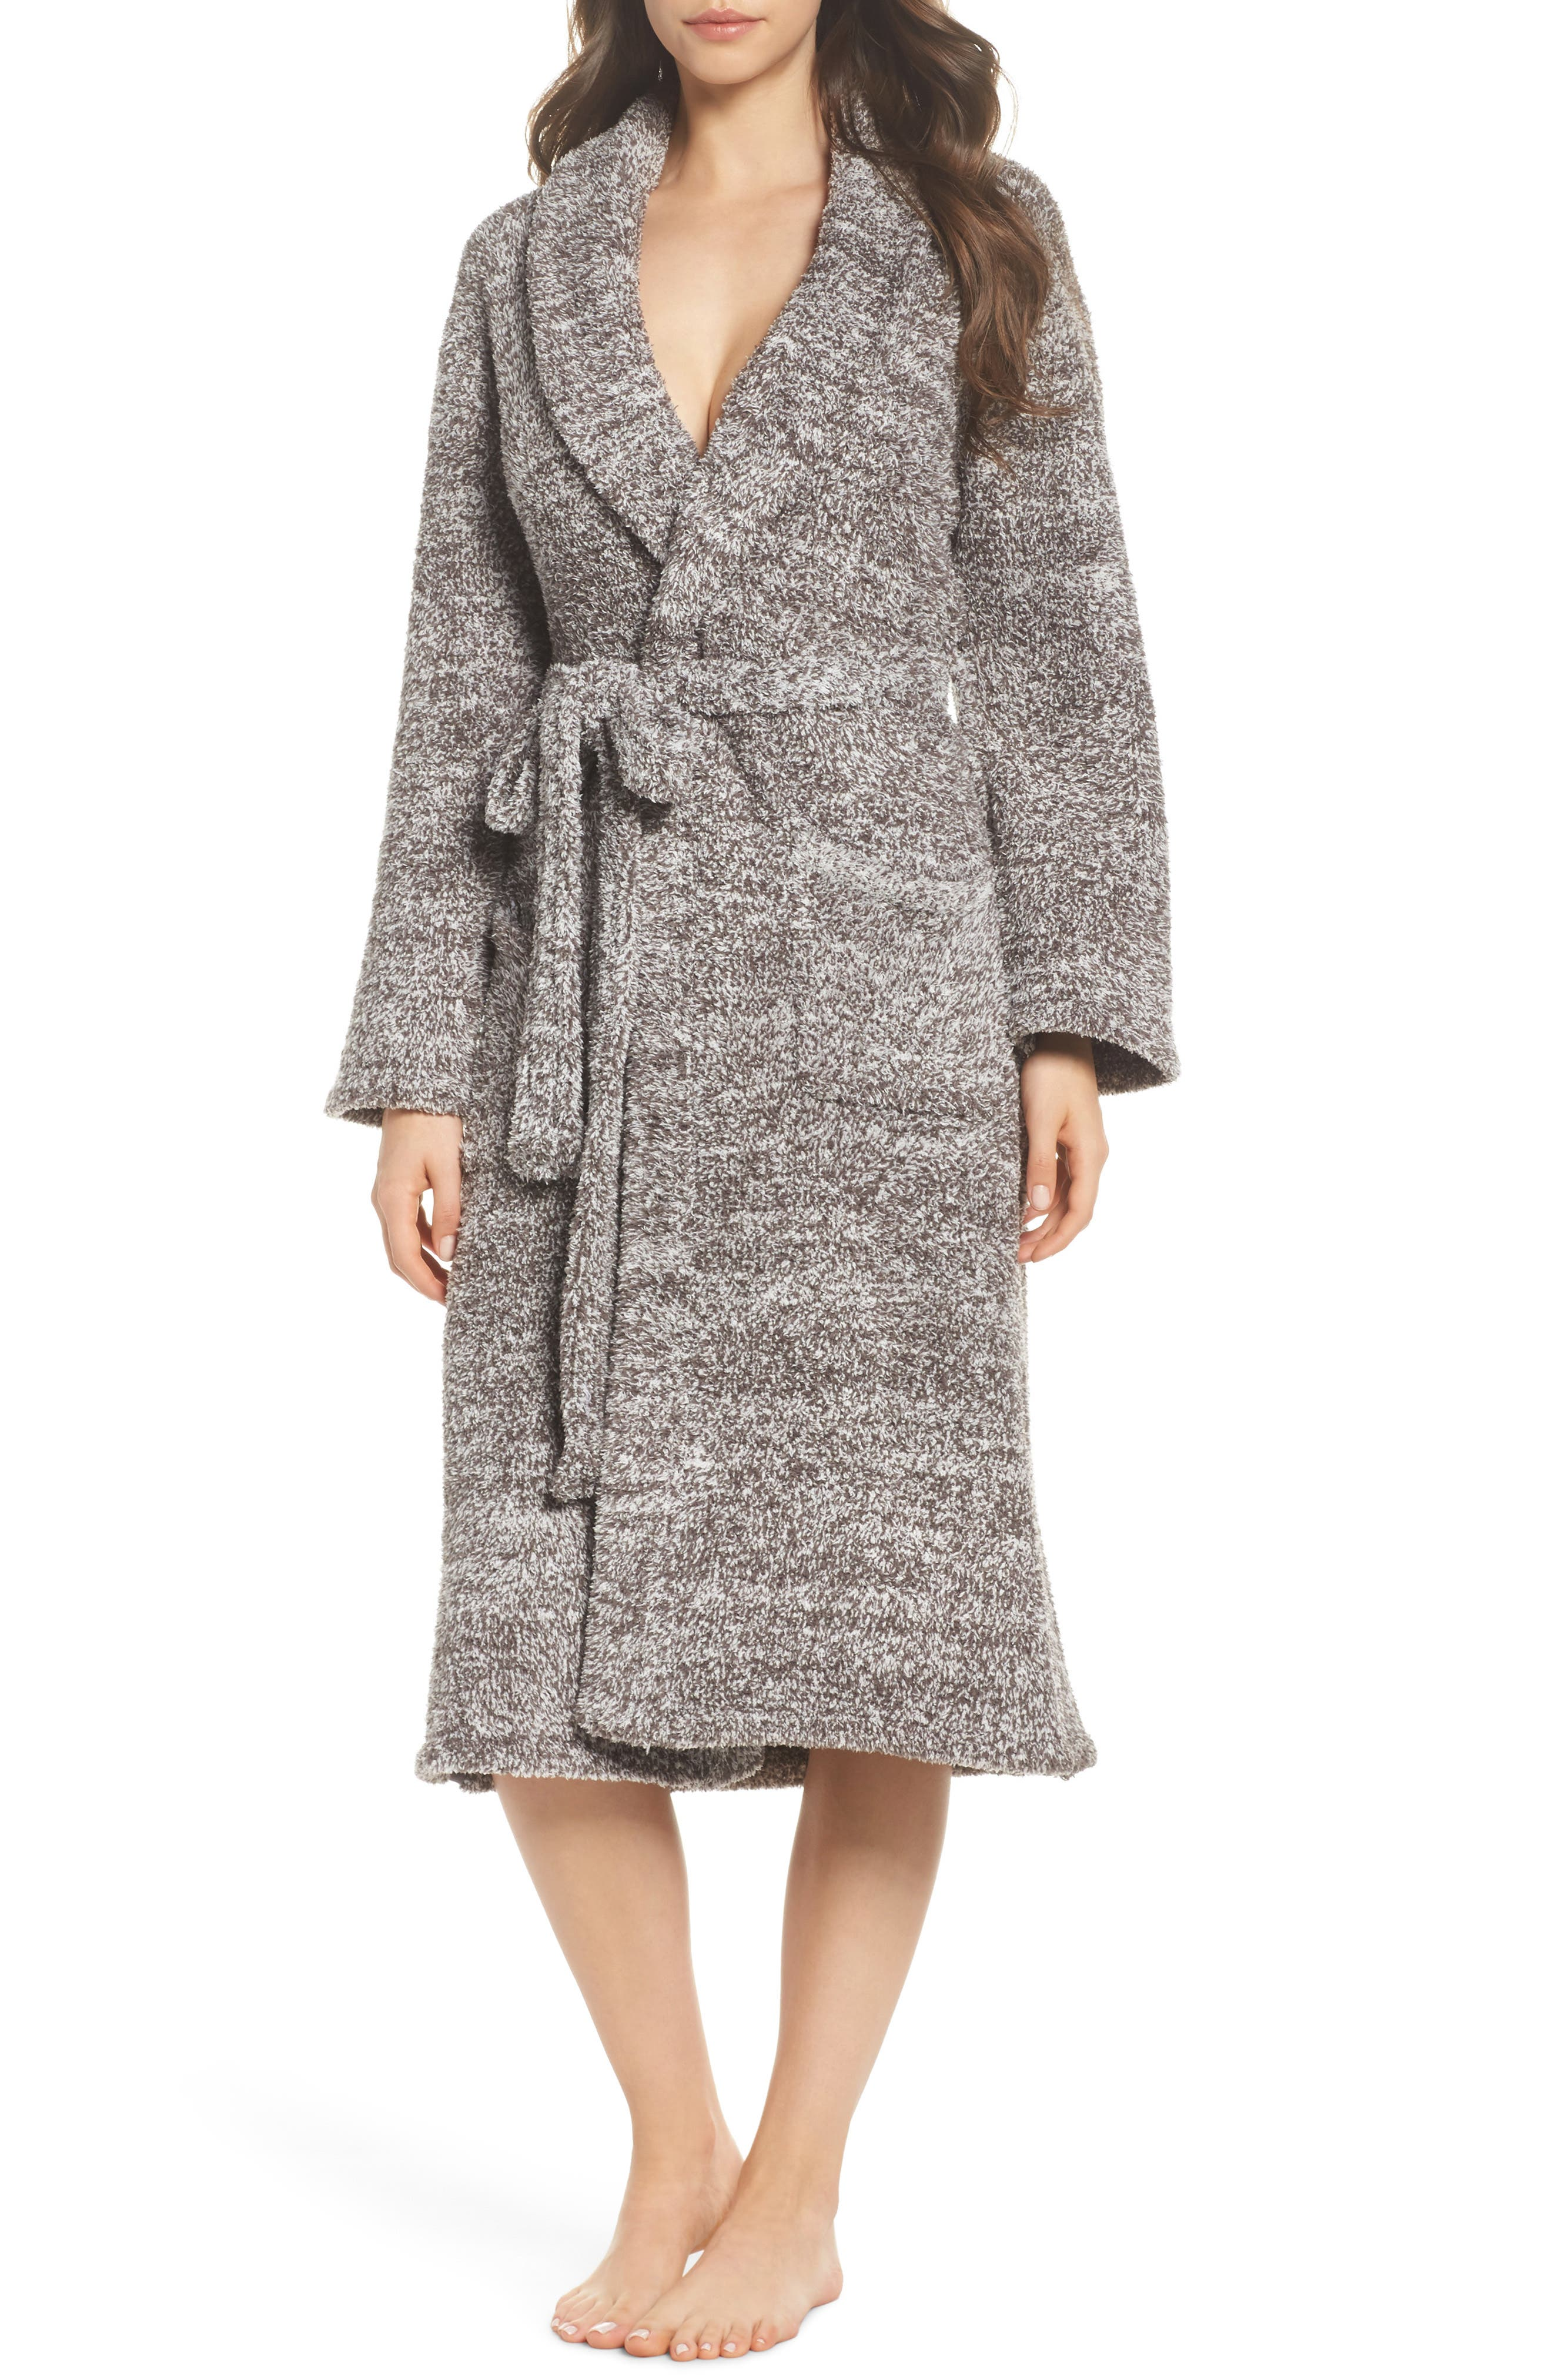 CozyChic<sup>®</sup> Robe,                         Main,                         color, COCOA/ PEARL